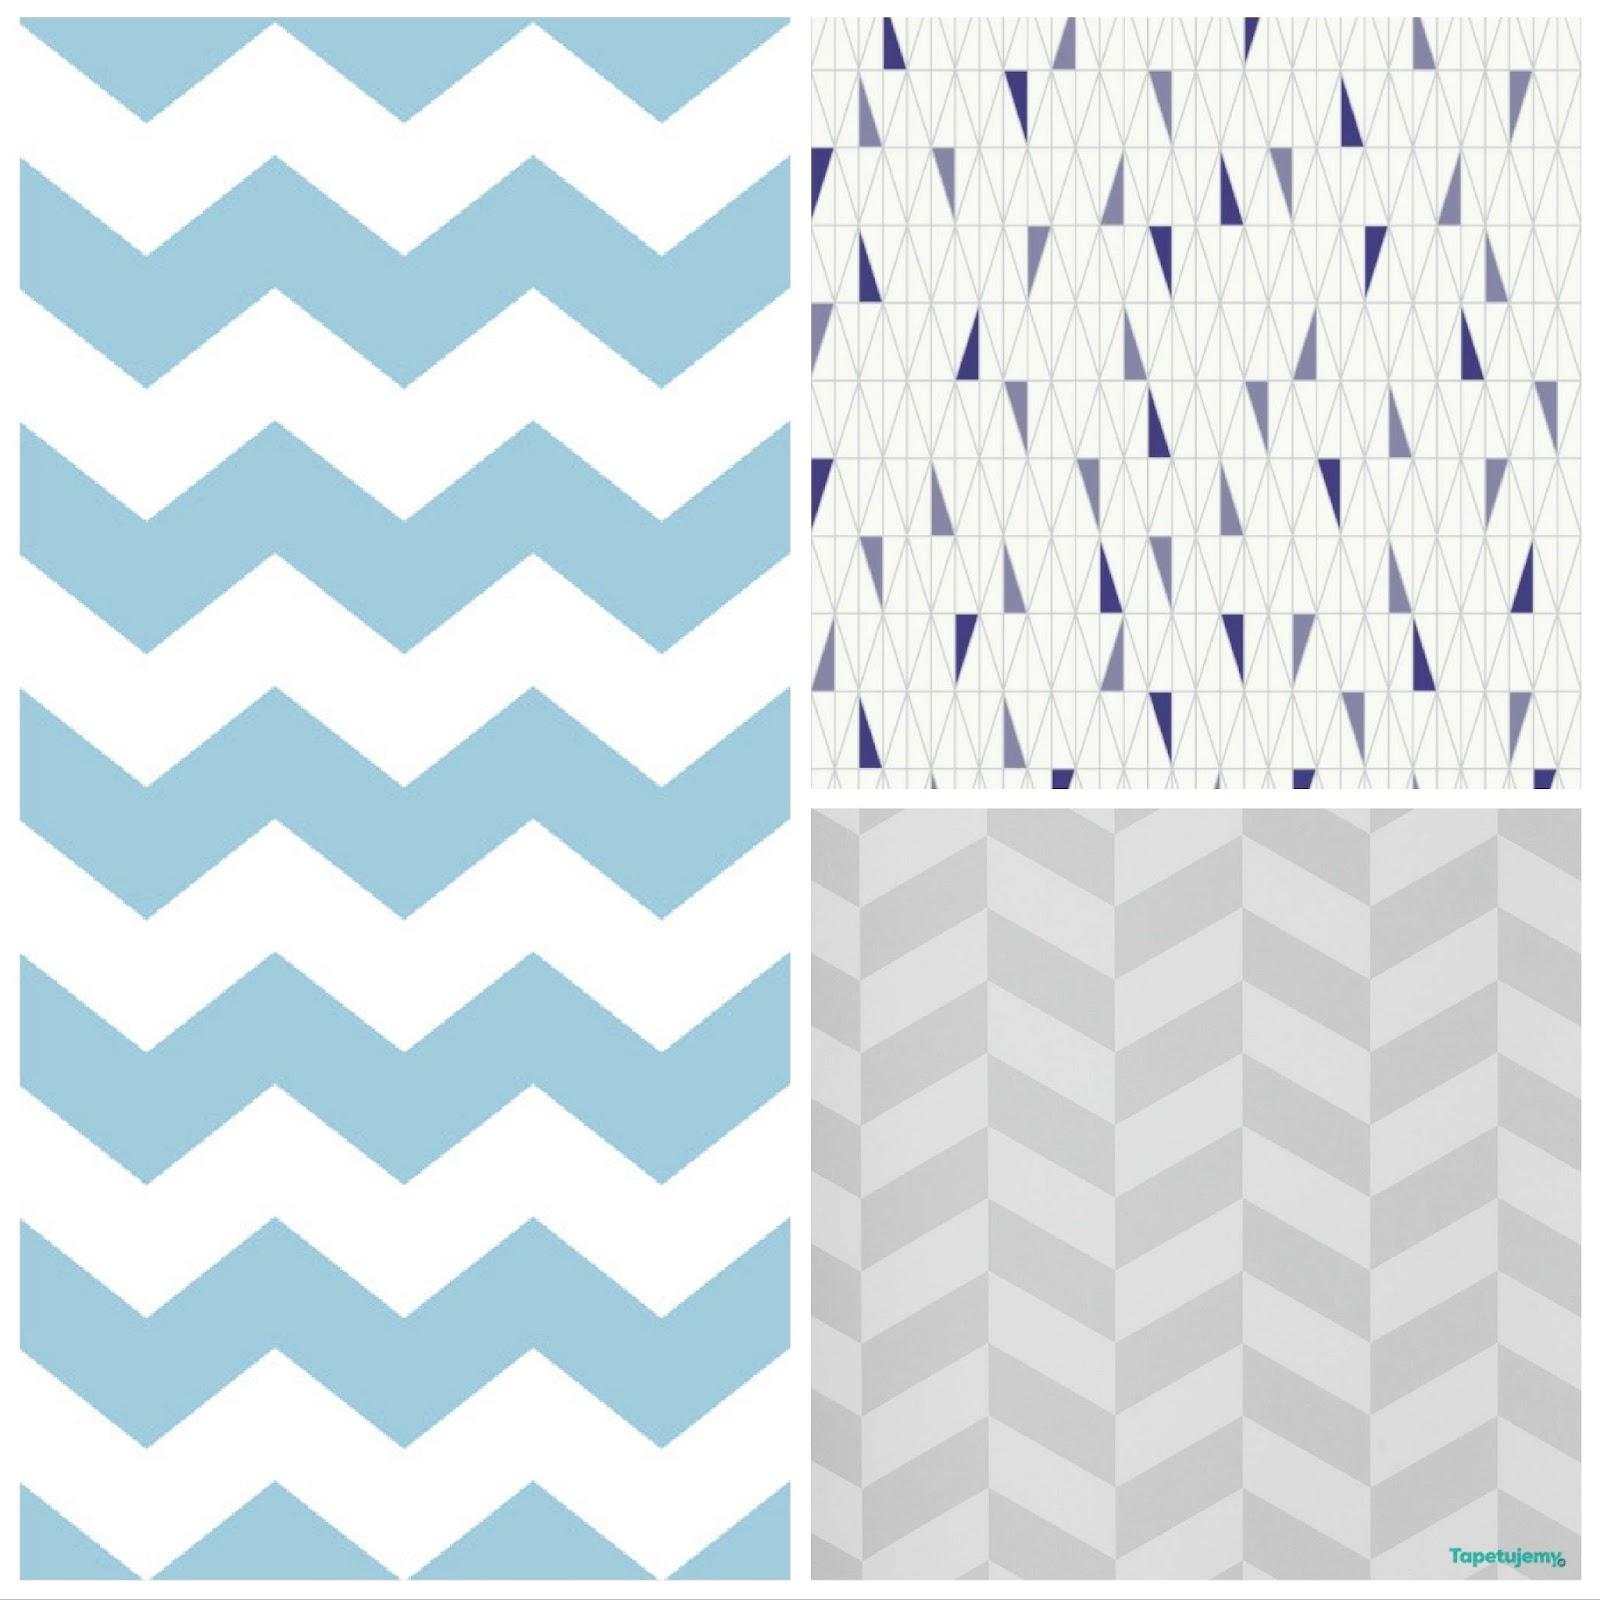 trójkąty, pastelowe wzory